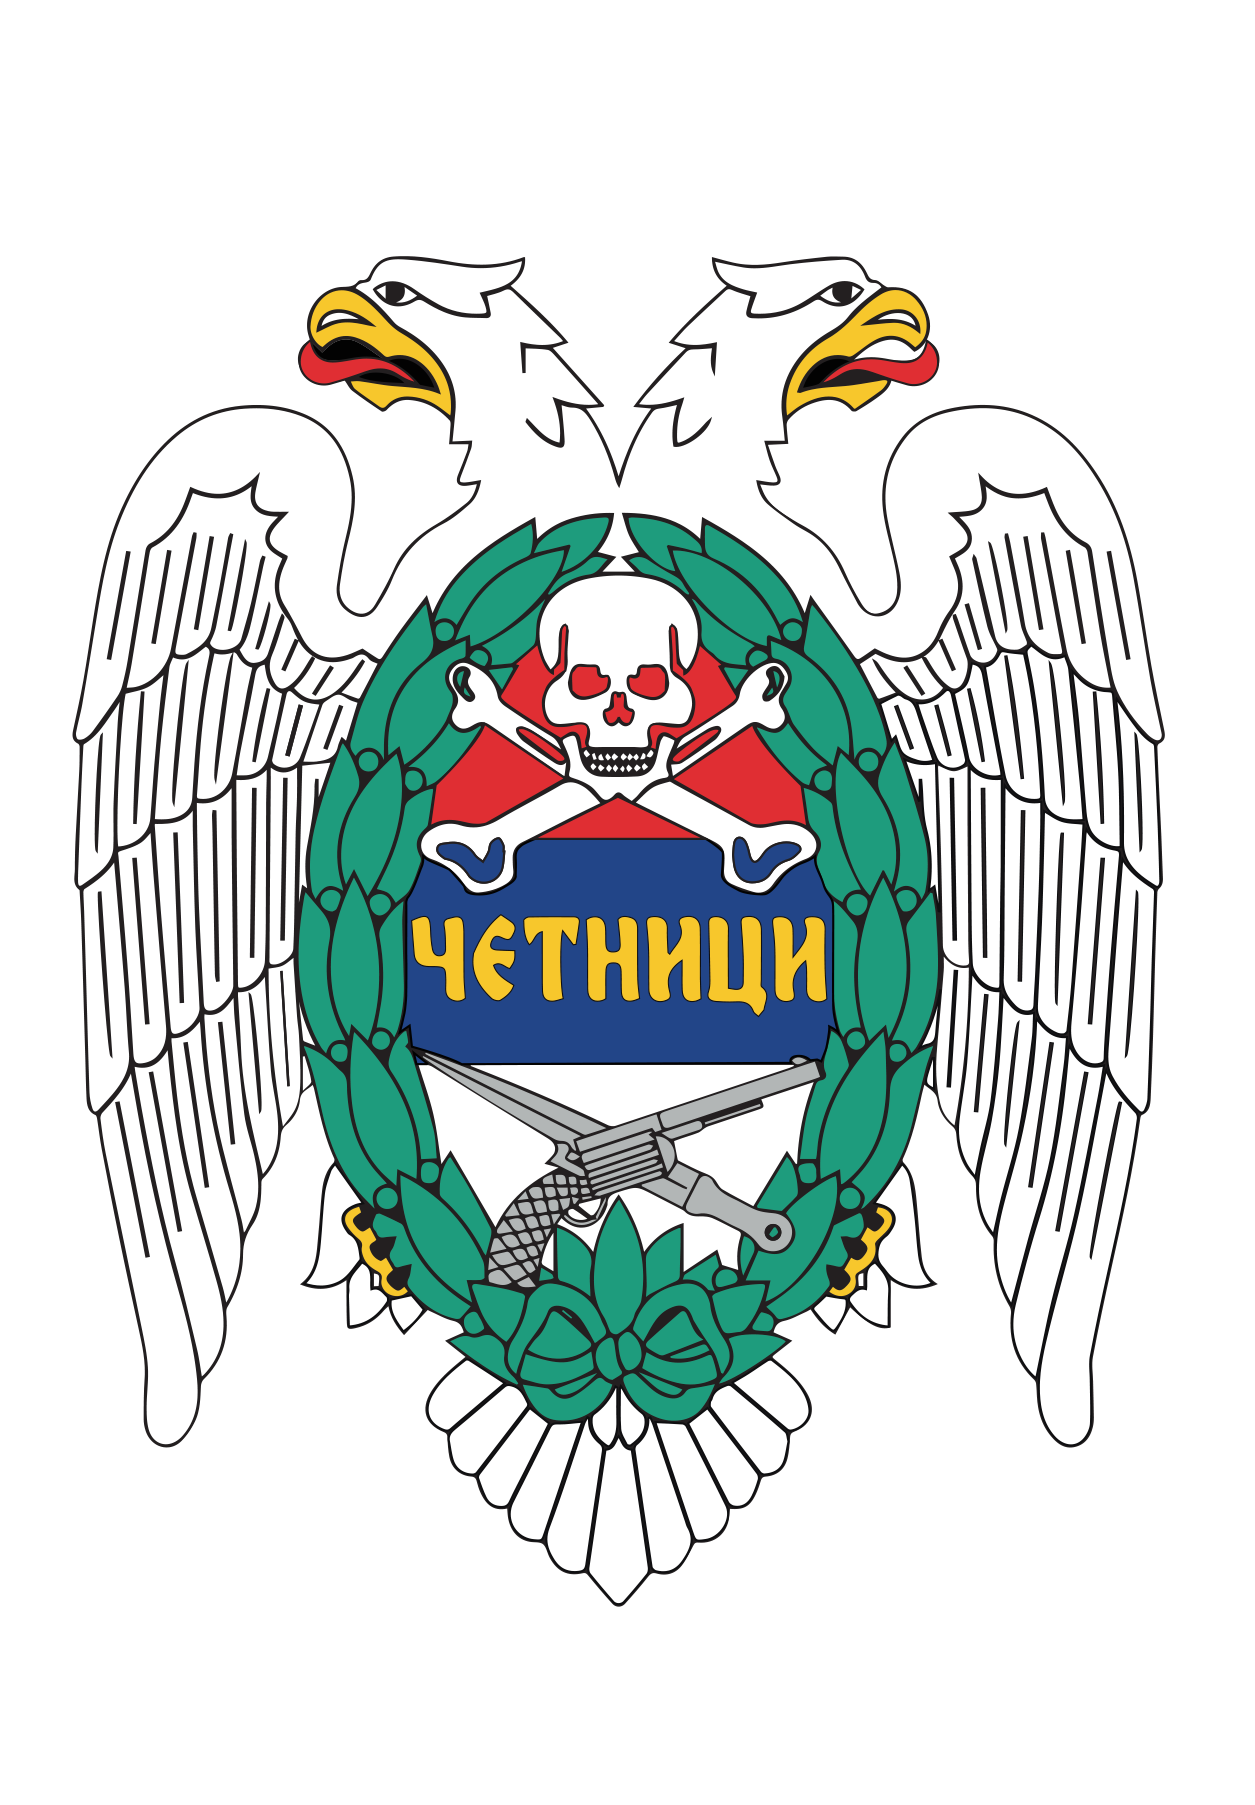 Serbian Chetniks Australia